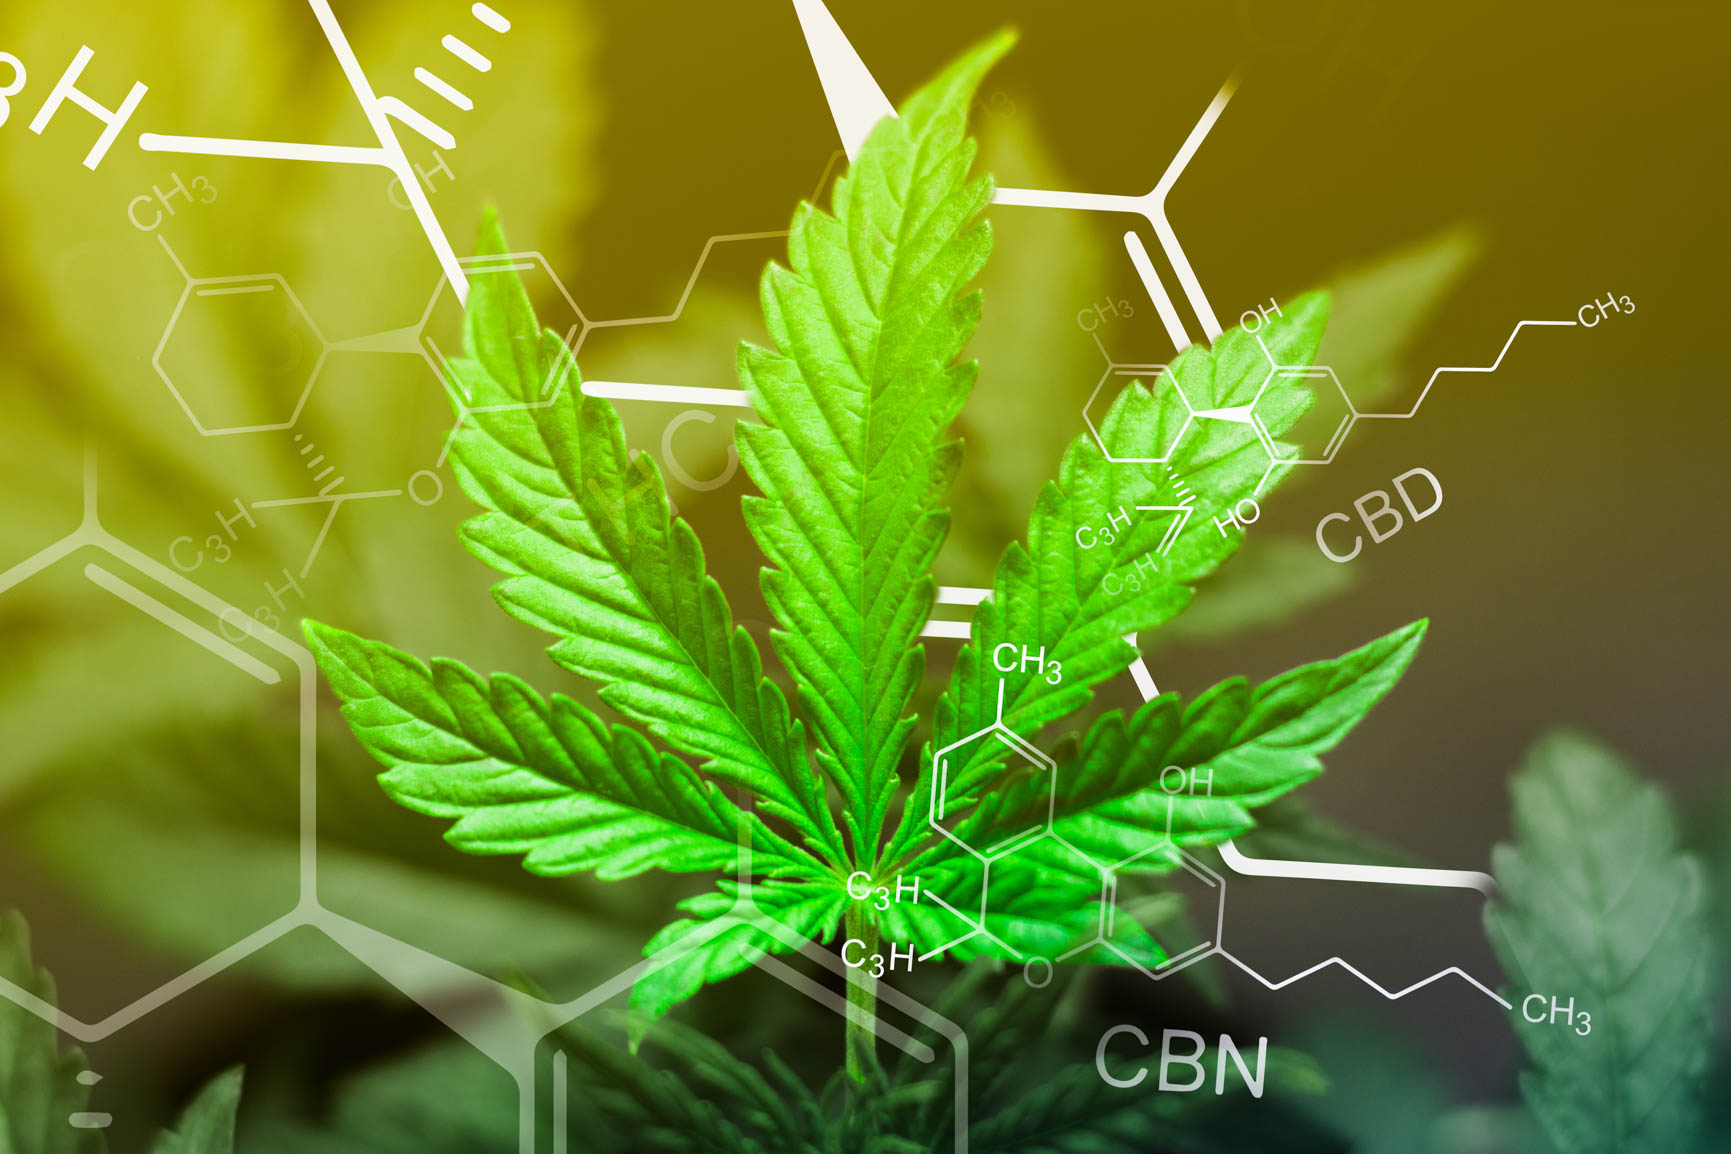 Photo of a hemp leaf with CBD molecular structure